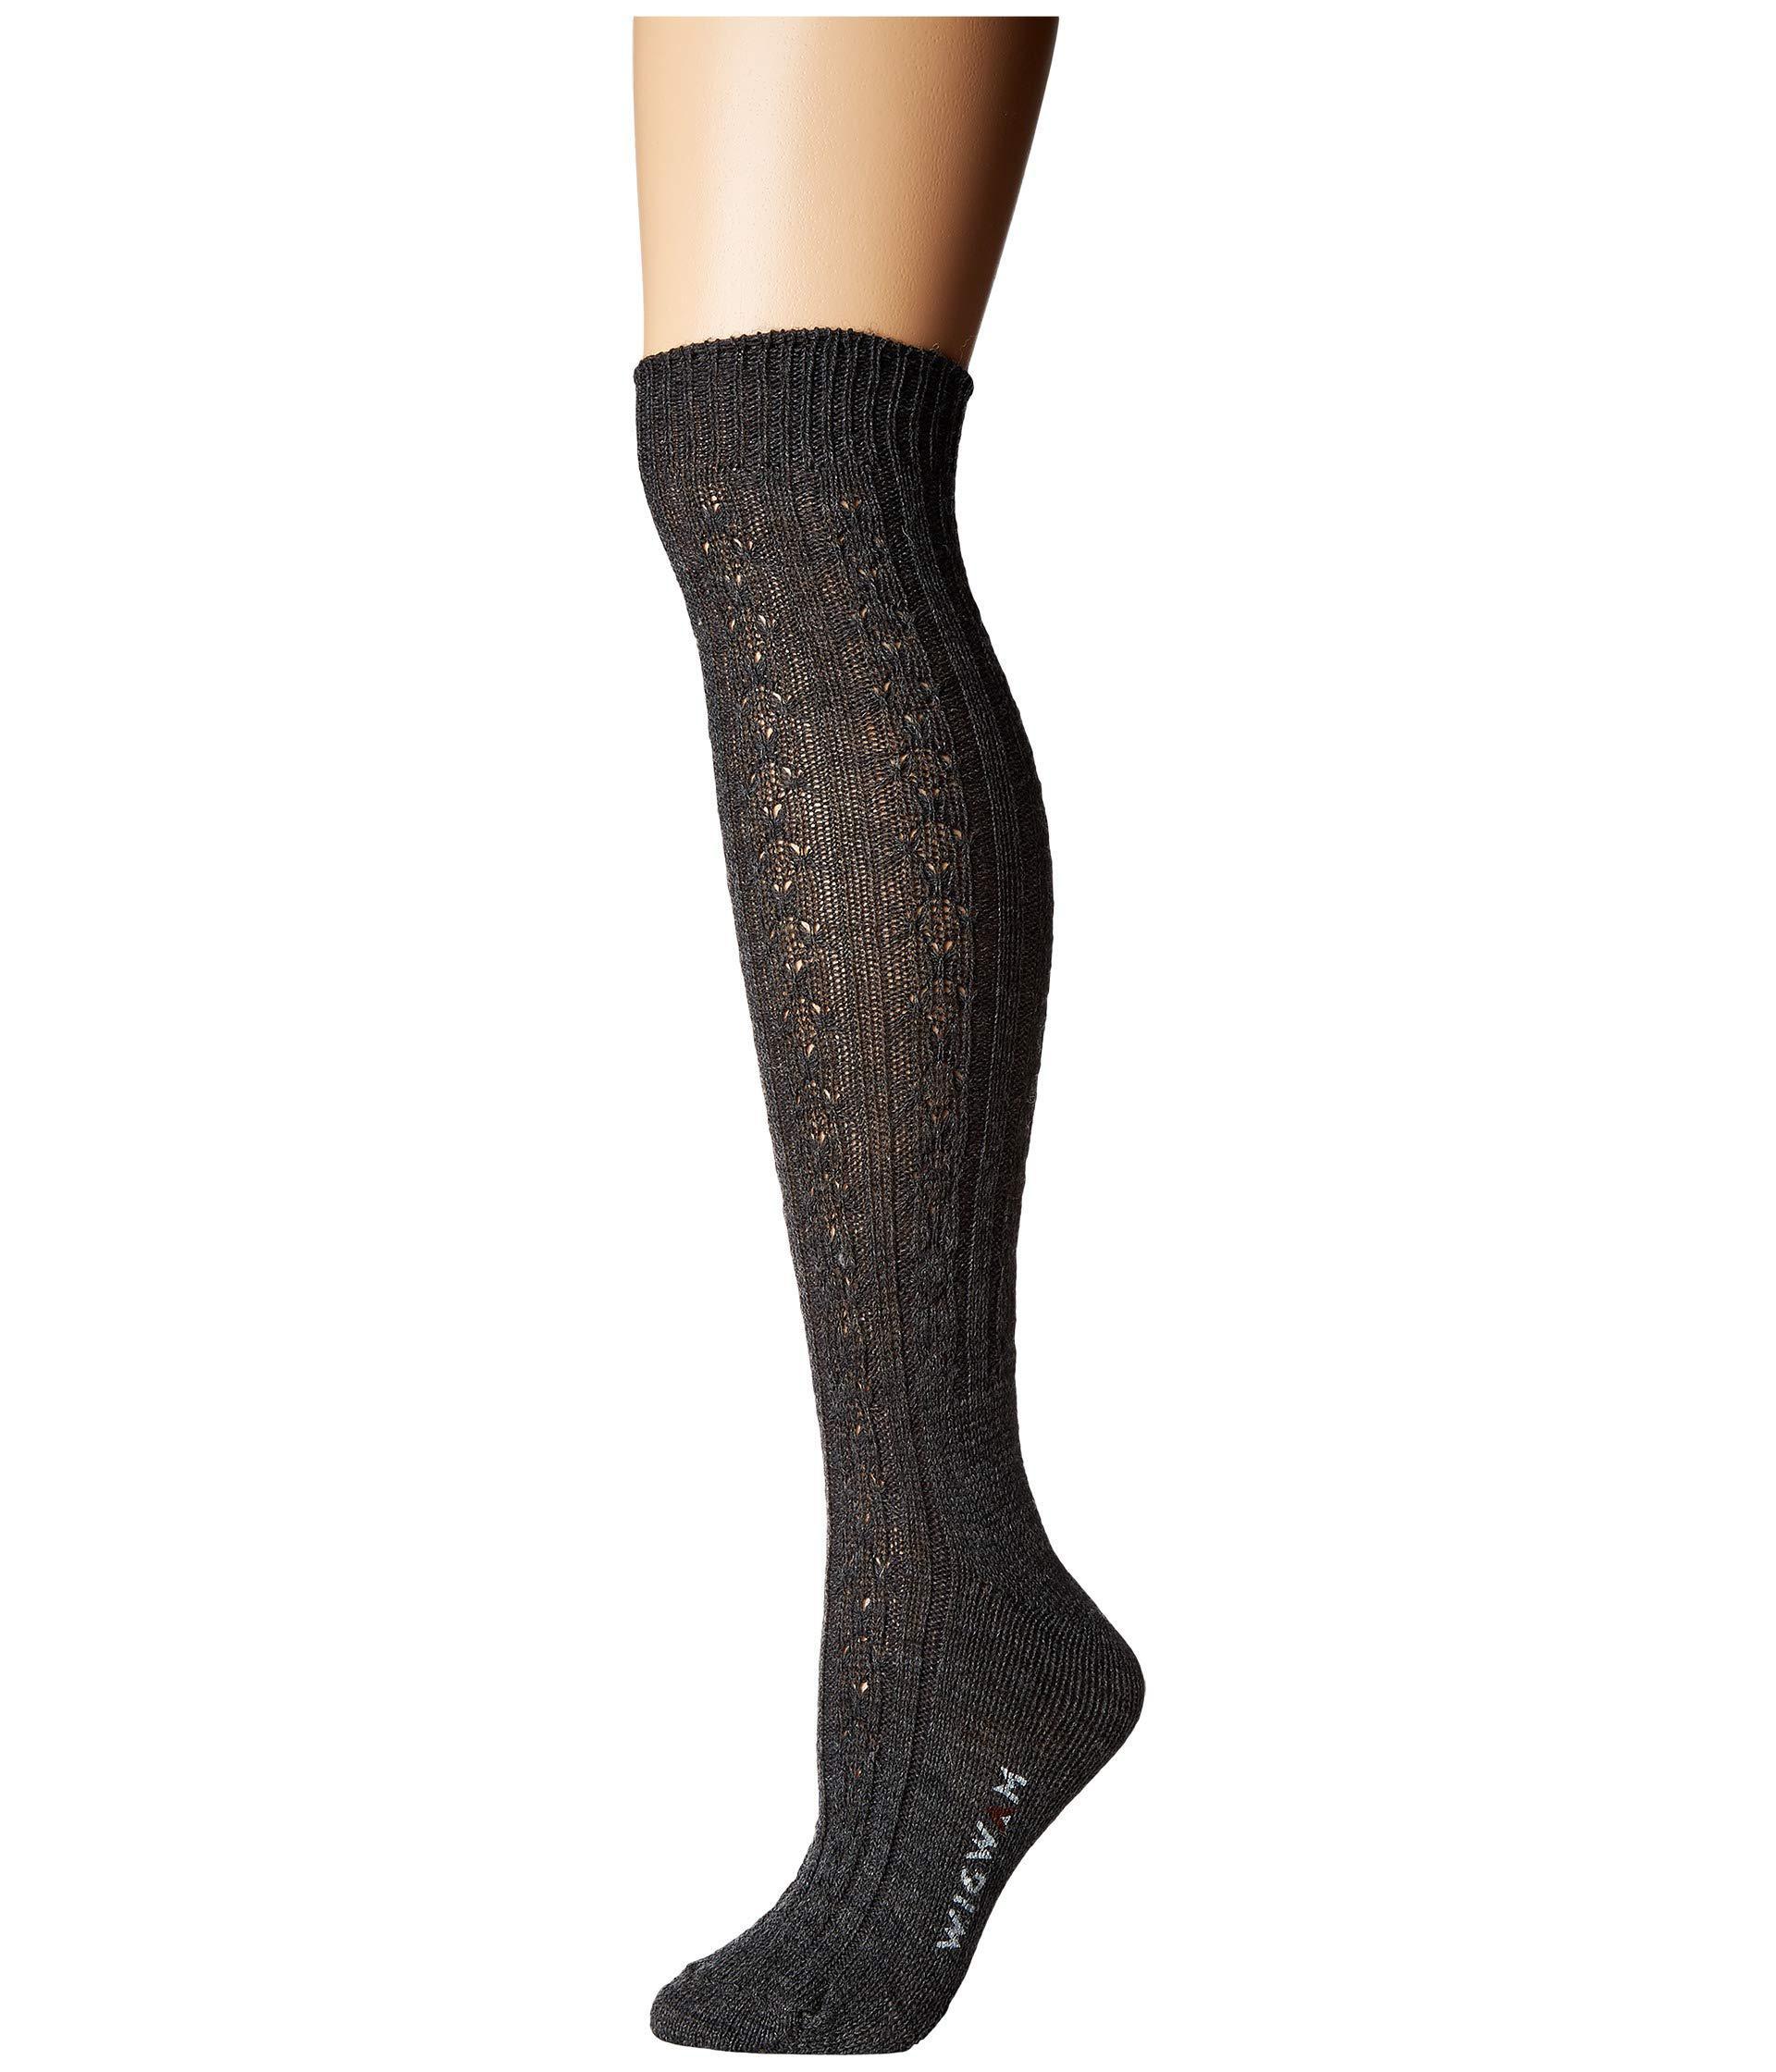 71f477185 Lyst - Wigwam Cable Knee Highs Single Pack (medium Grey Heather ...